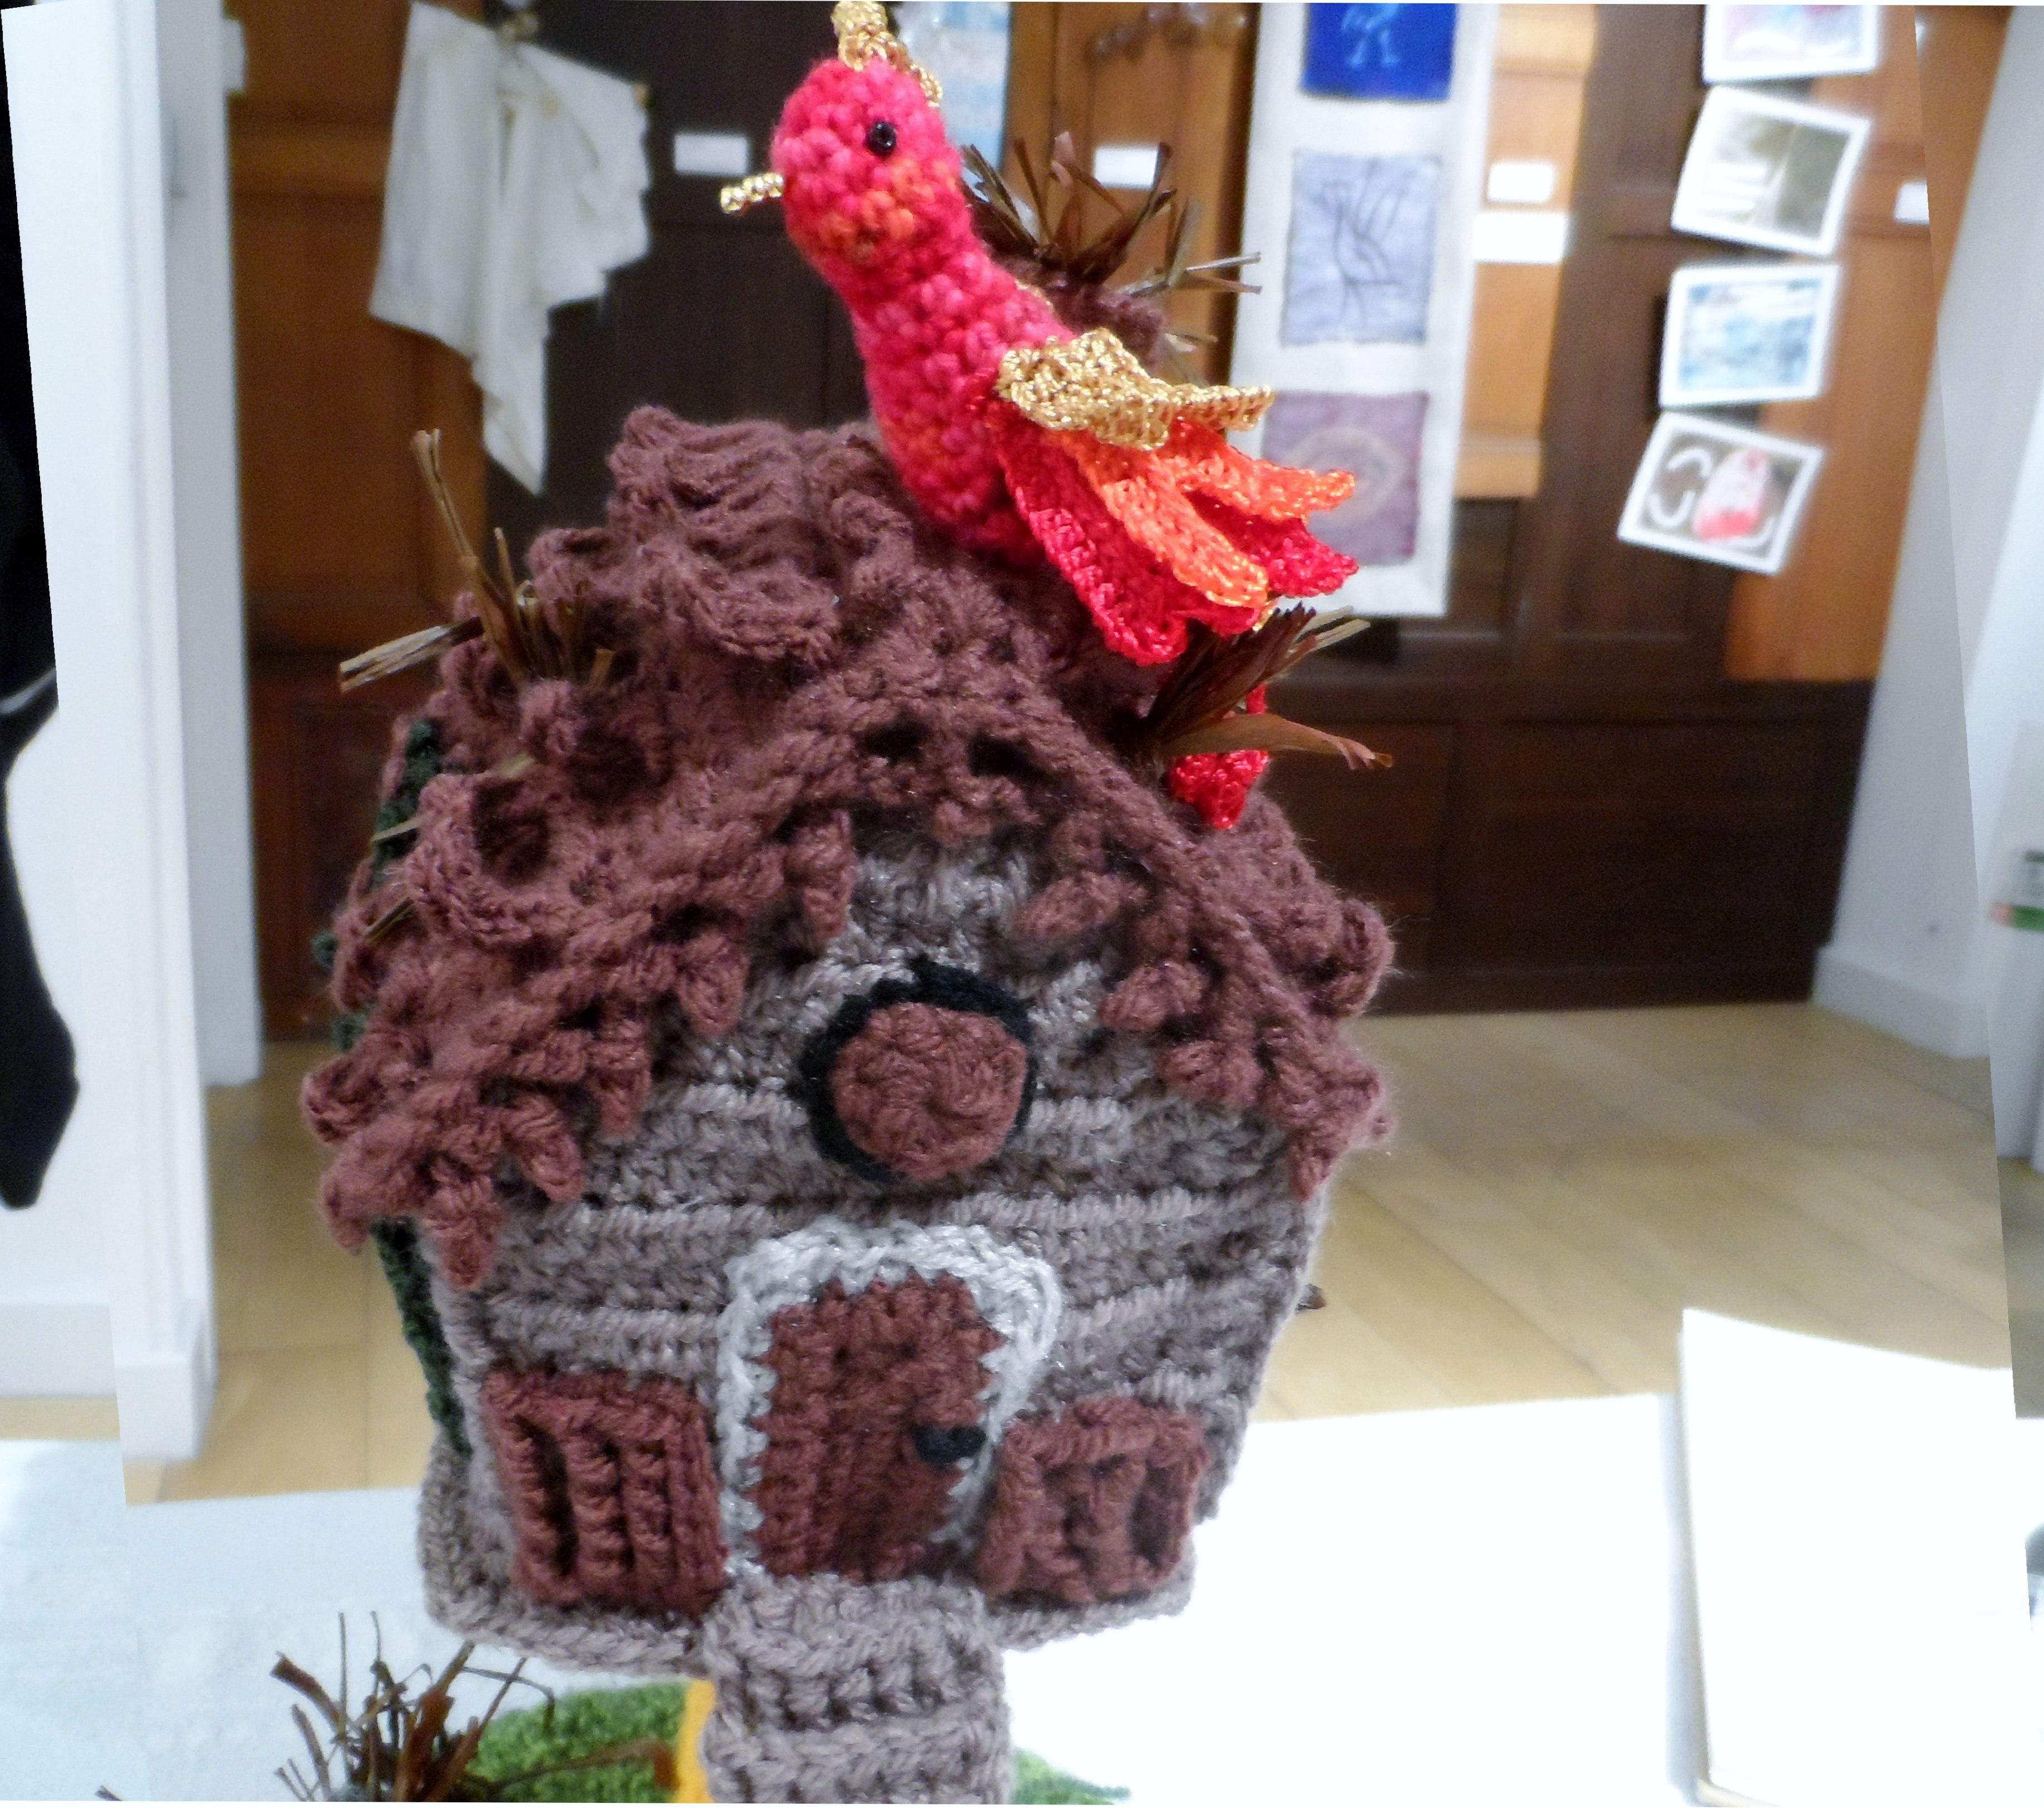 BABA YAGA'S IZBA by Ildiko Szabo, freeform crochet, Re-View Testile exhibition, Nov 2019